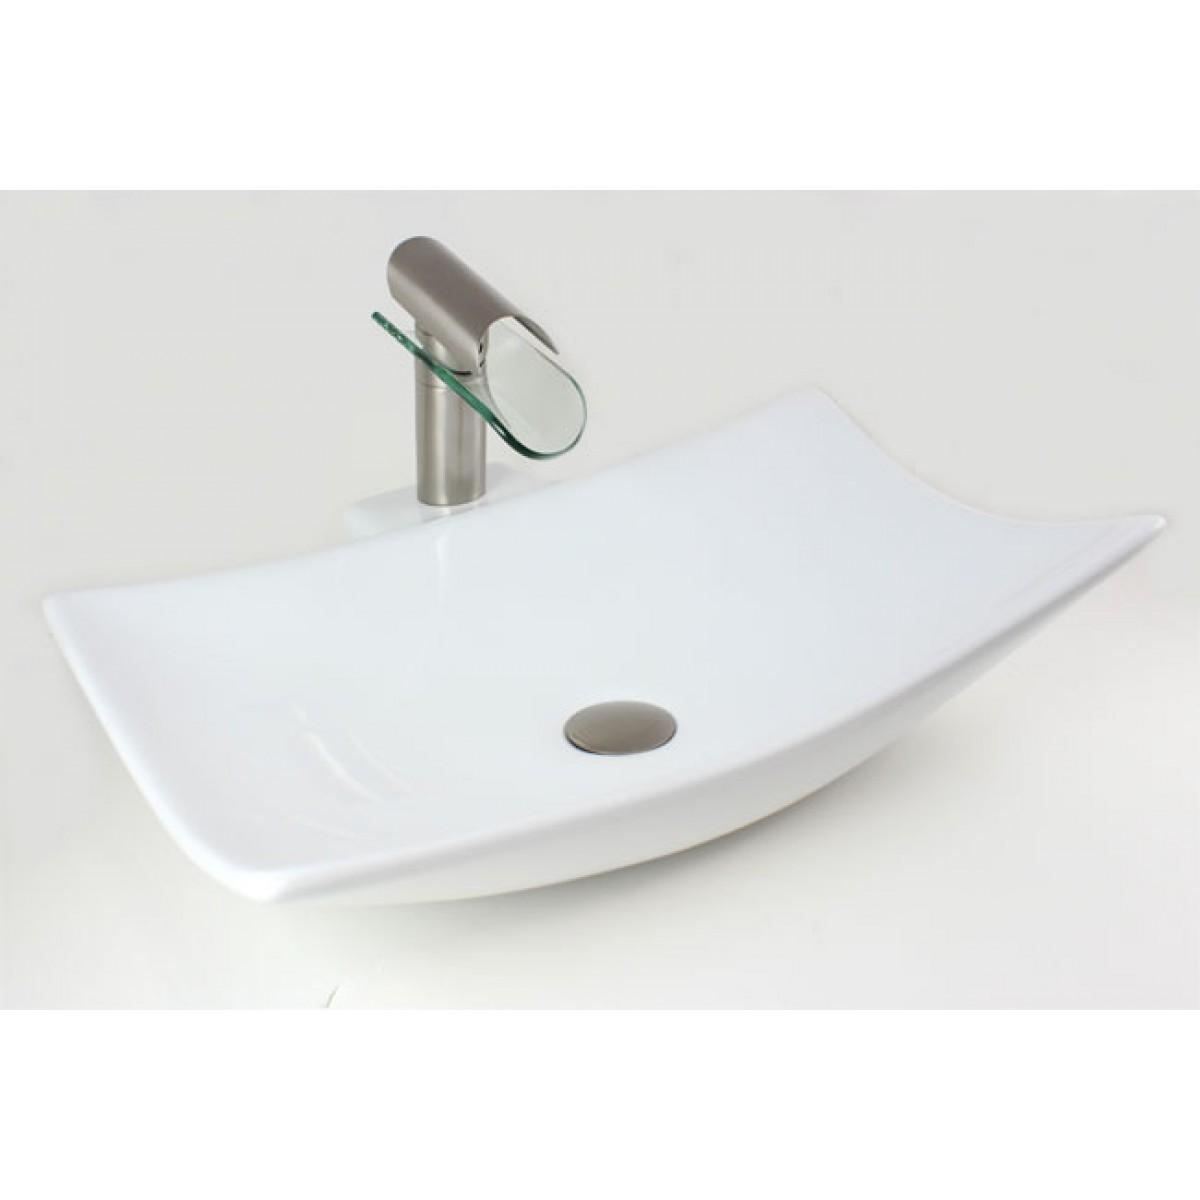 porcelain ceramic single hole countertop bathroom vessel sink x x 578 inch